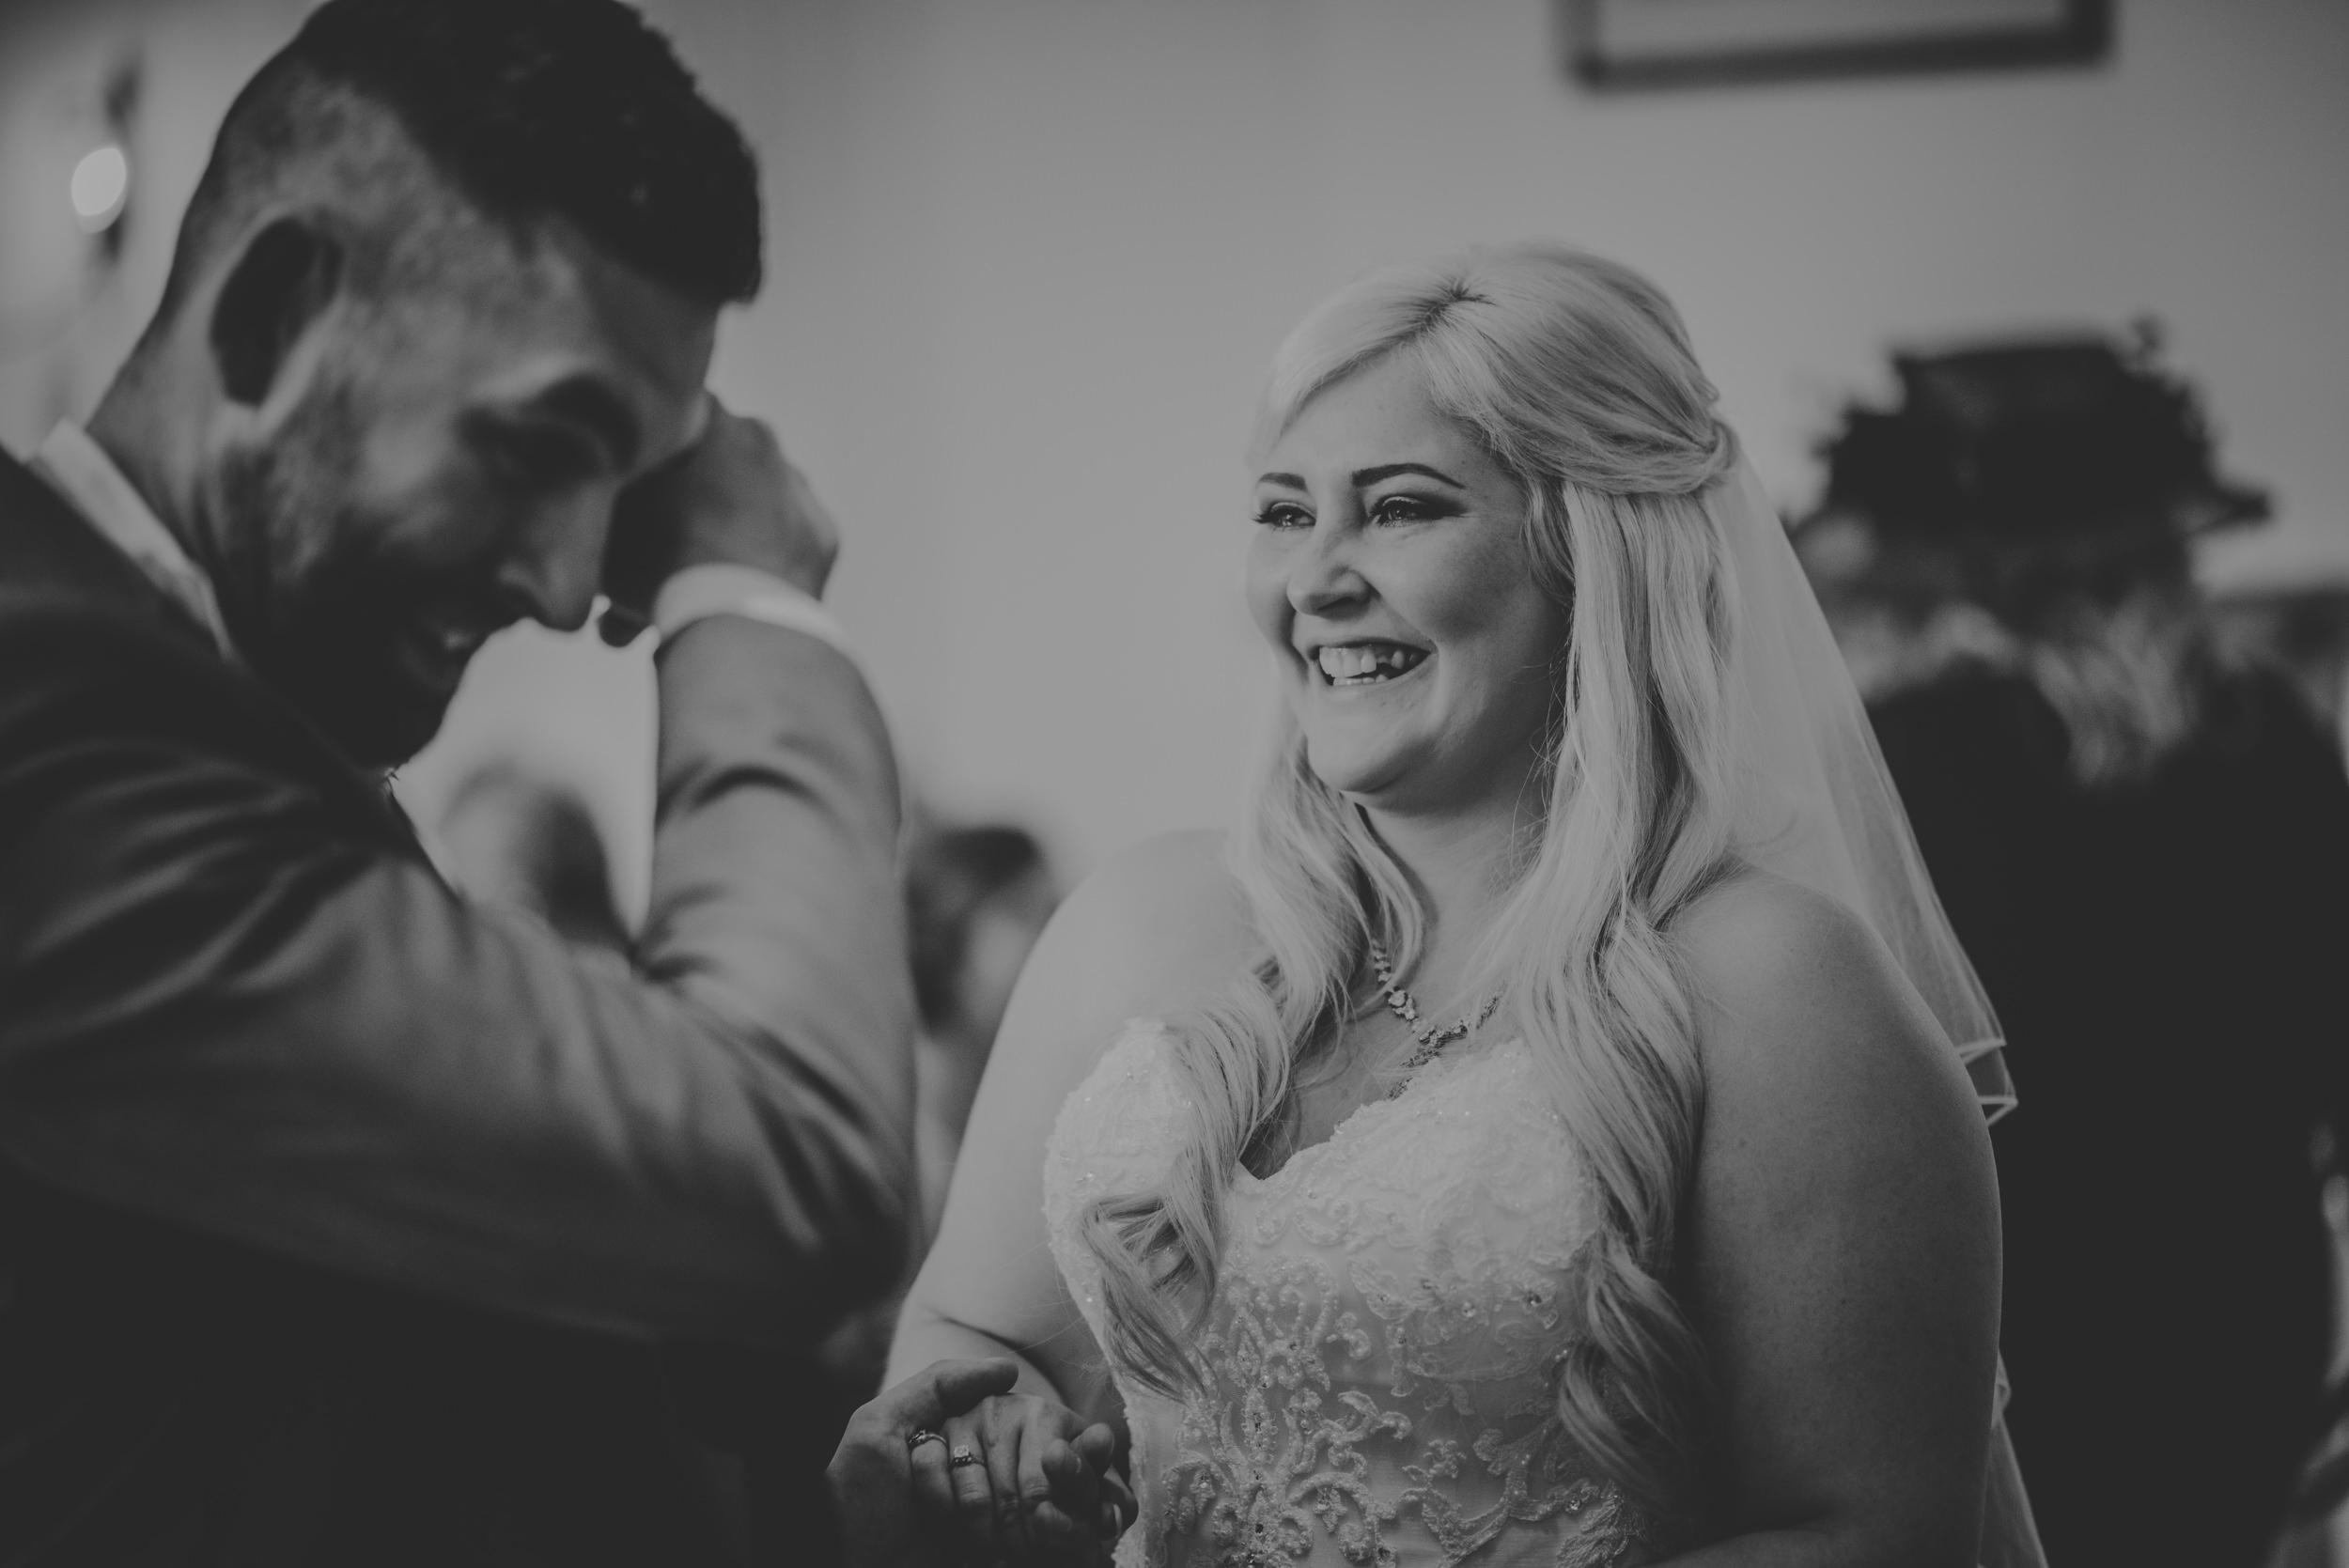 Rachel-and-James-Wedding-Horsley-Towers-State-Manu-Mendoza-Wedding-Photography-255.jpg